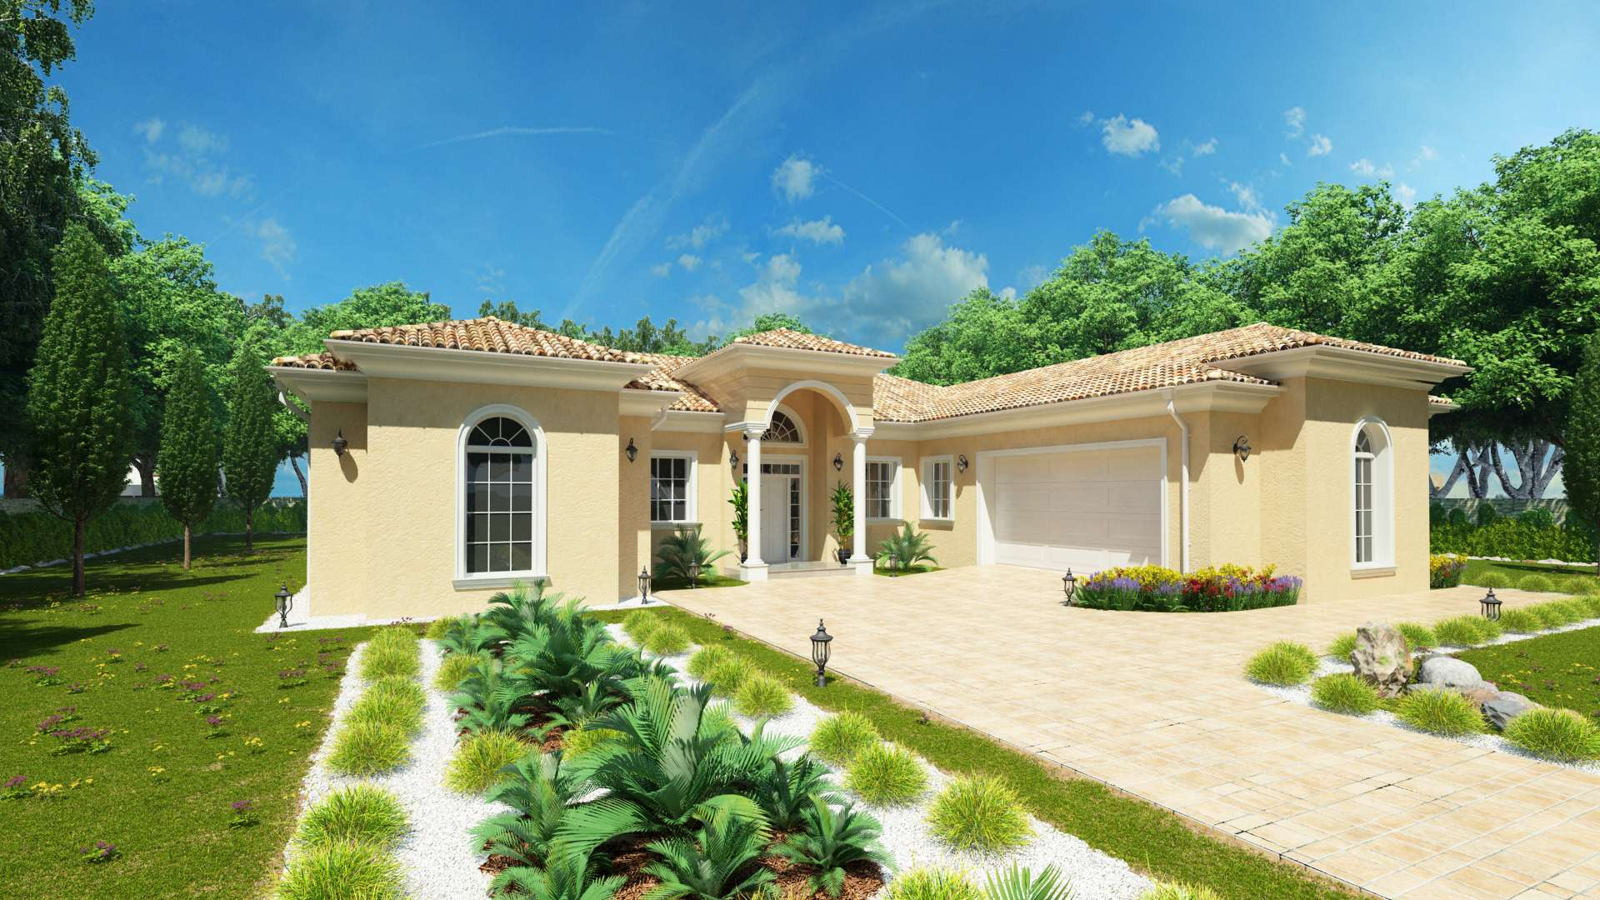 Projekt luxusného domu CASA CASTILIA